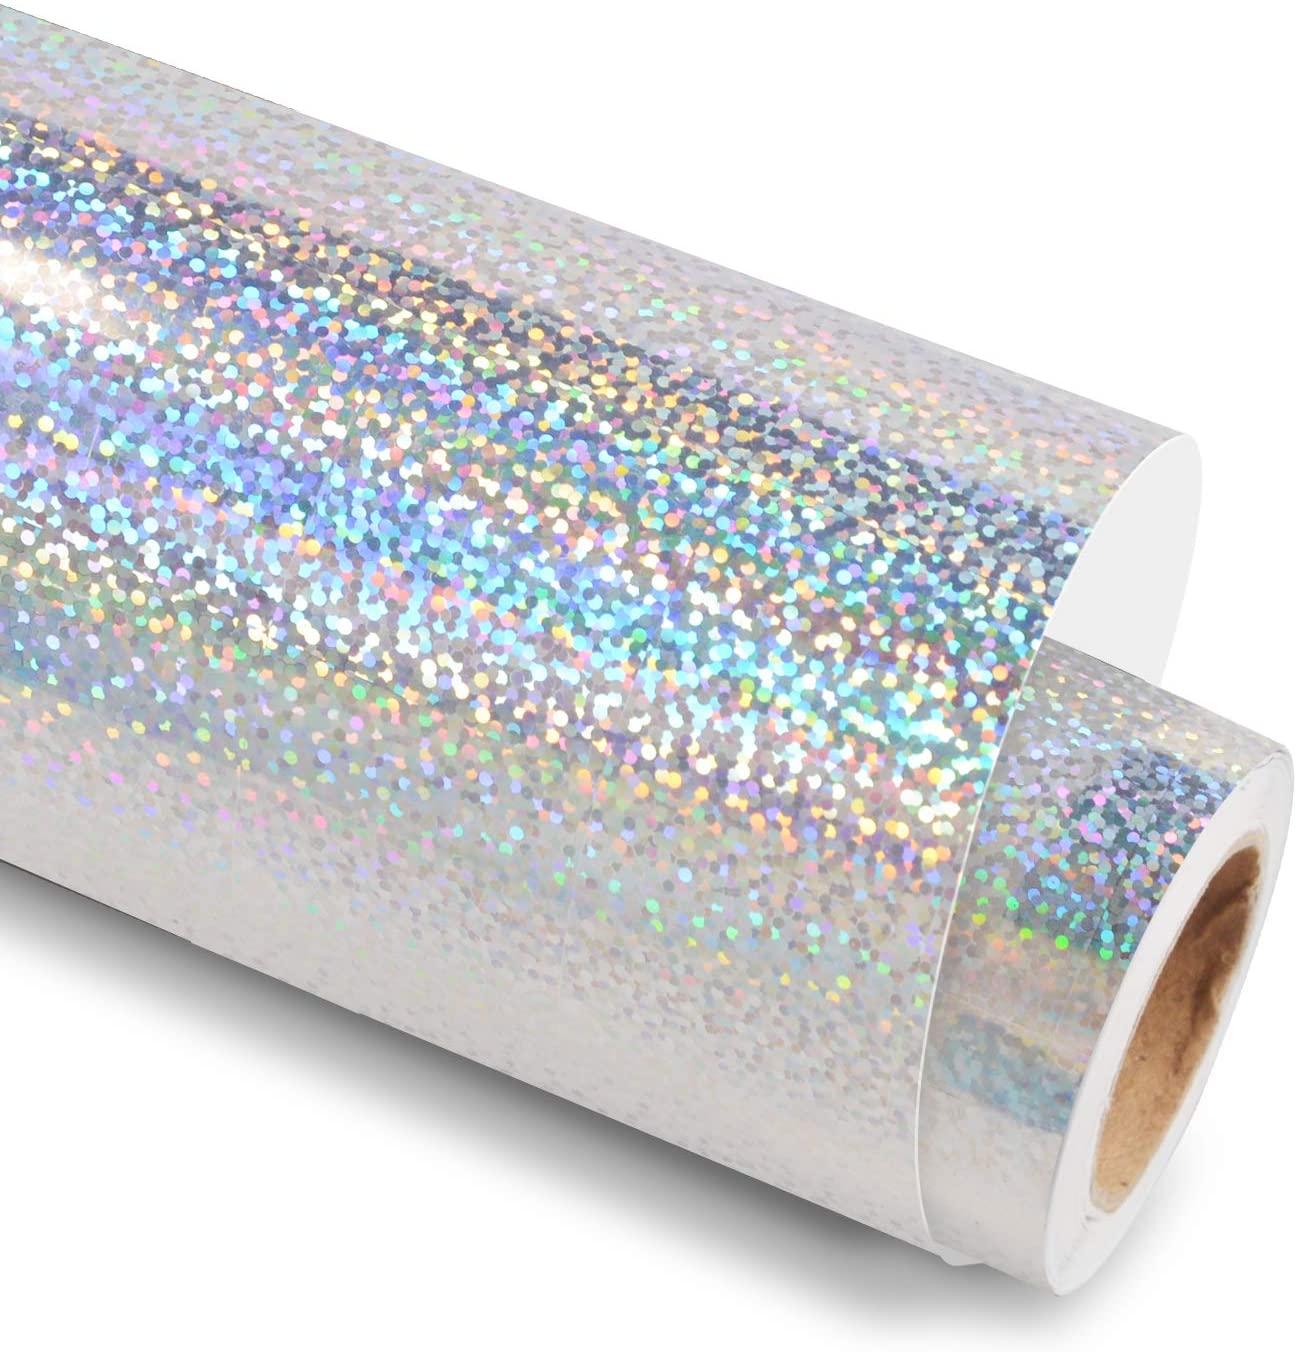 Vinil Envelopamento Holografico Glitter - 60 CM